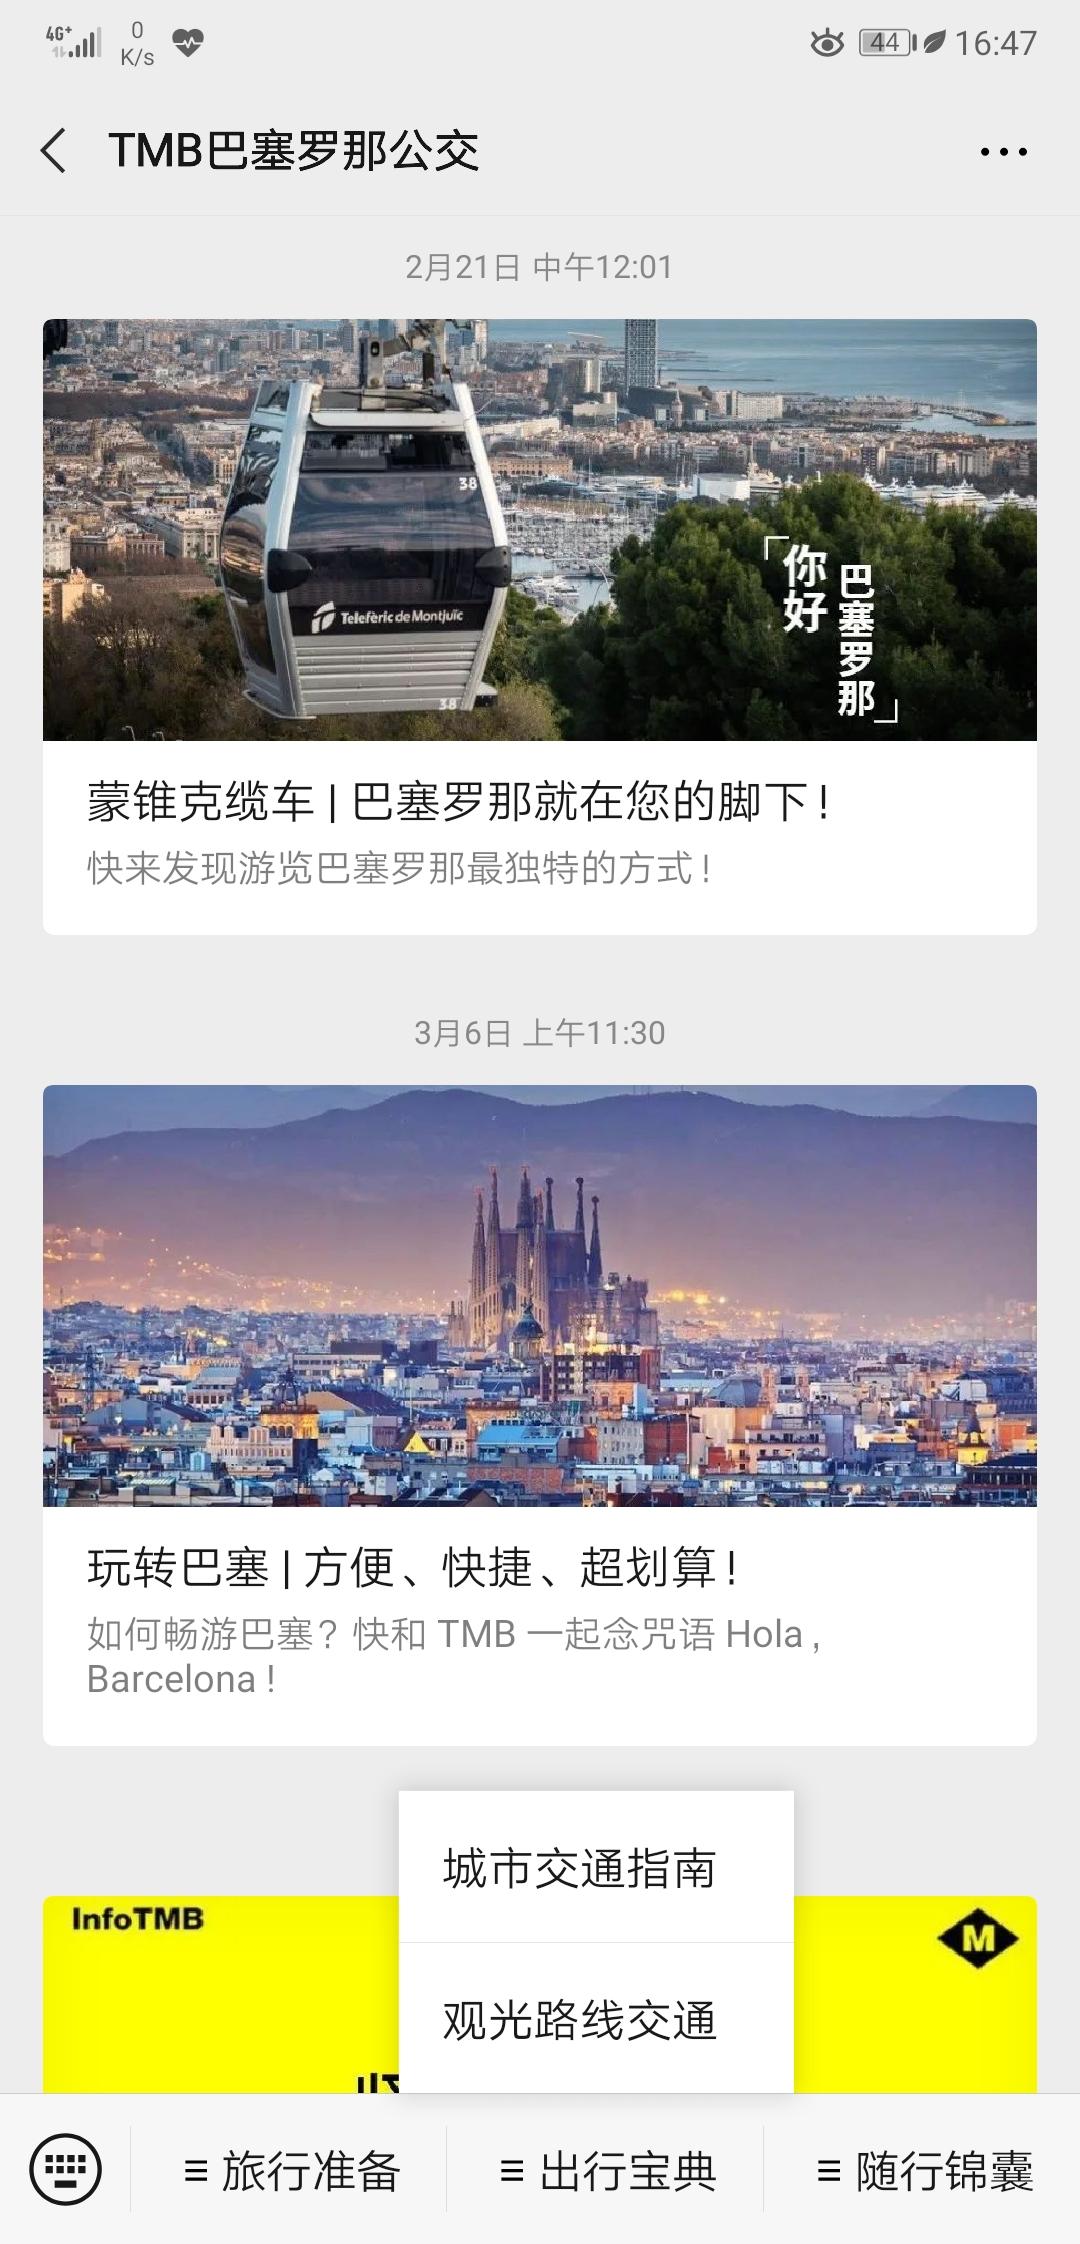 Transports Metropolitans de Barcelona WeChat official account